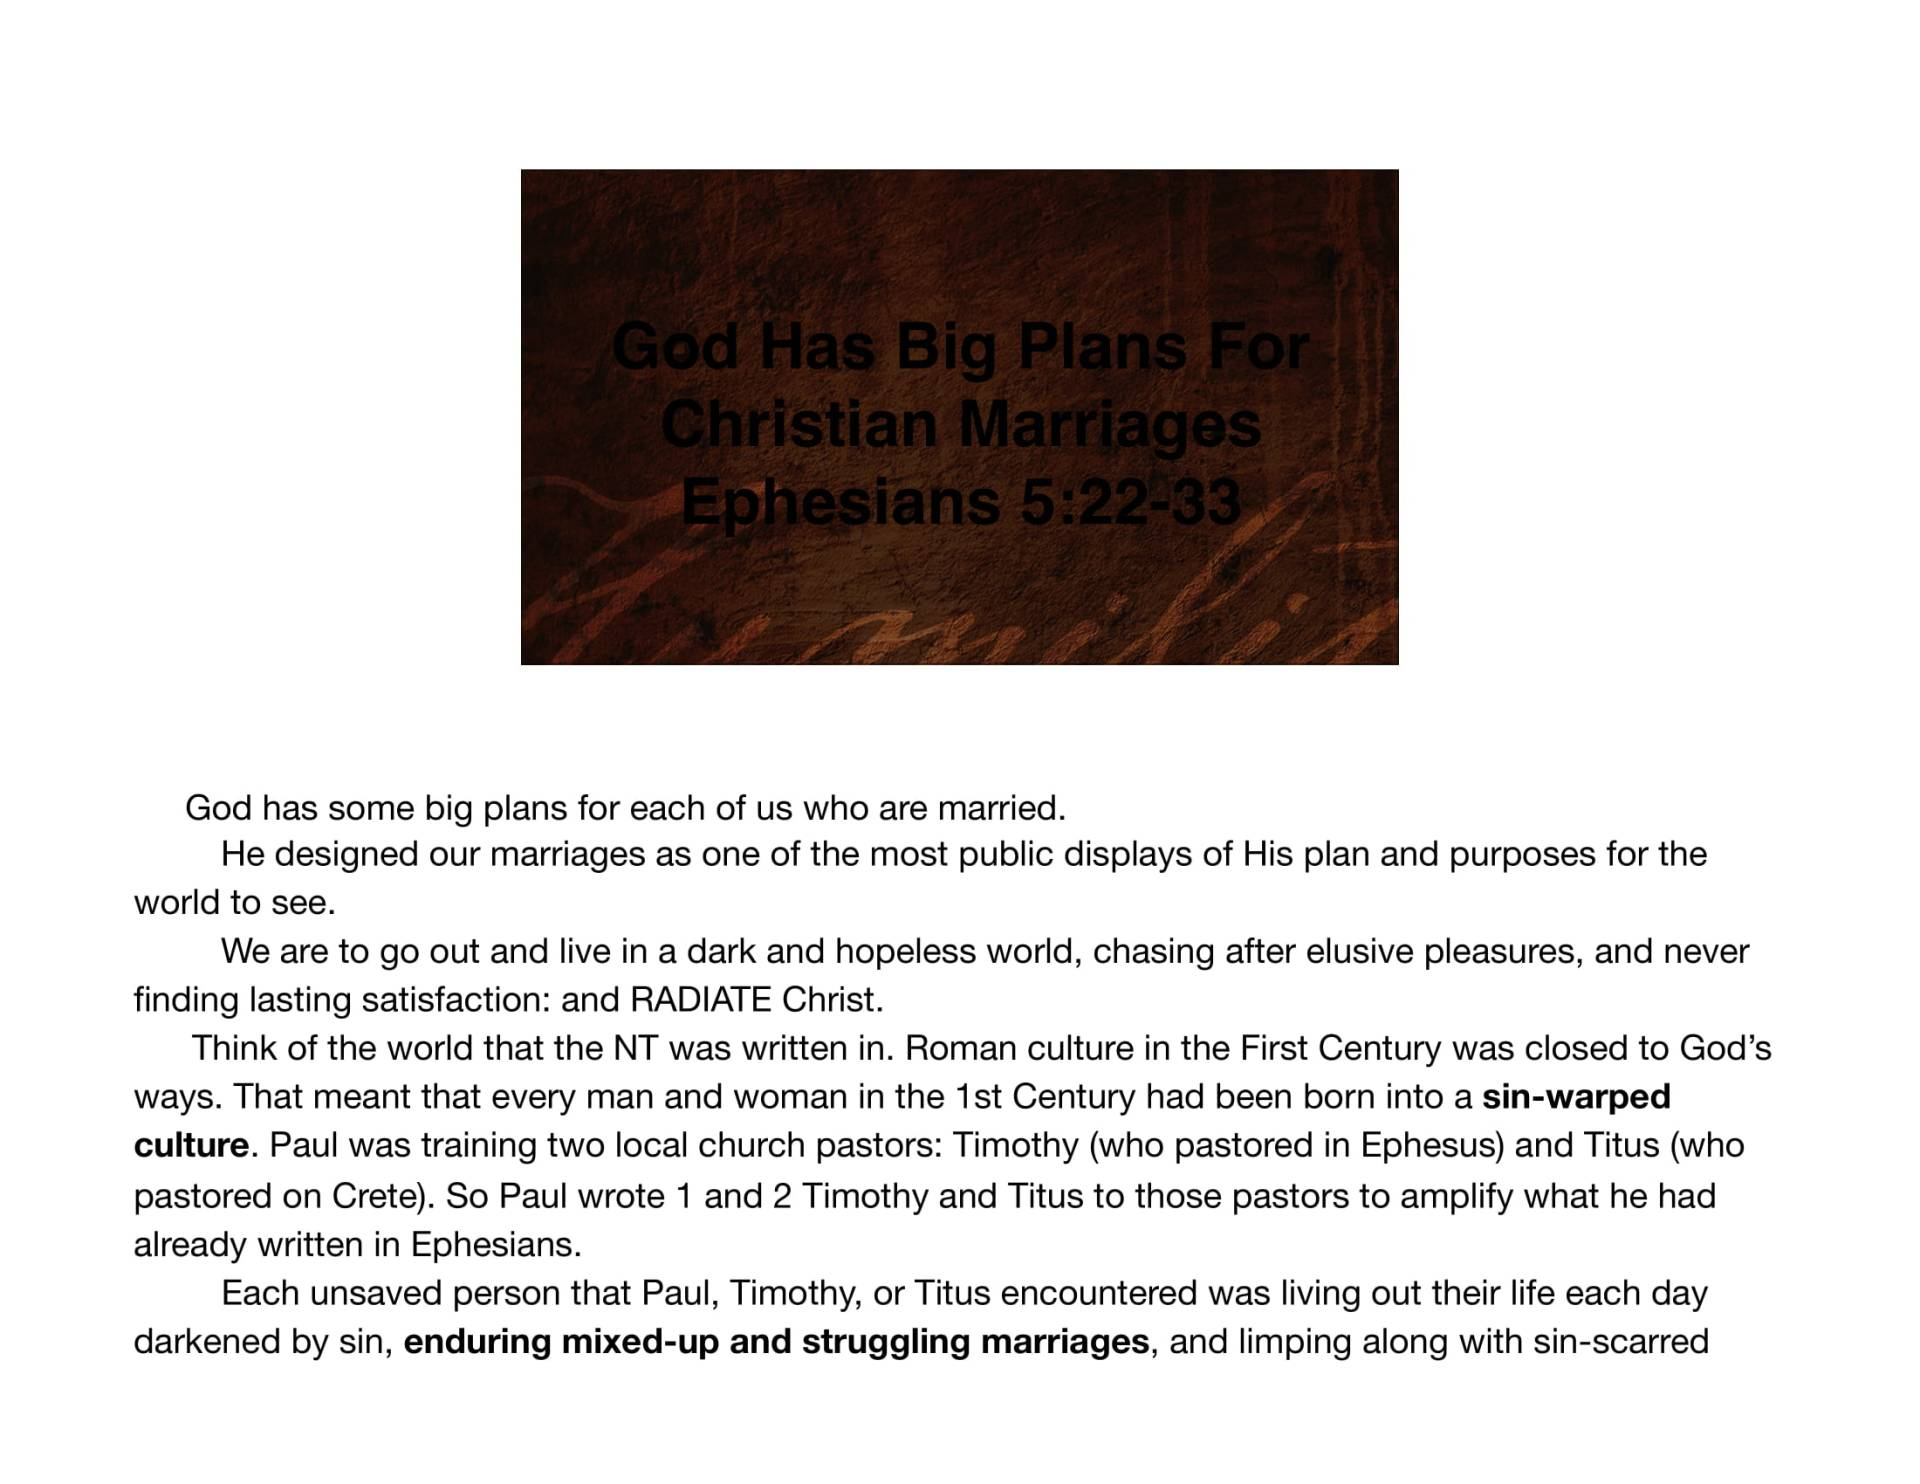 LGI-04 - Caution Men - Spiritual Maturity Is Not Automatic-08